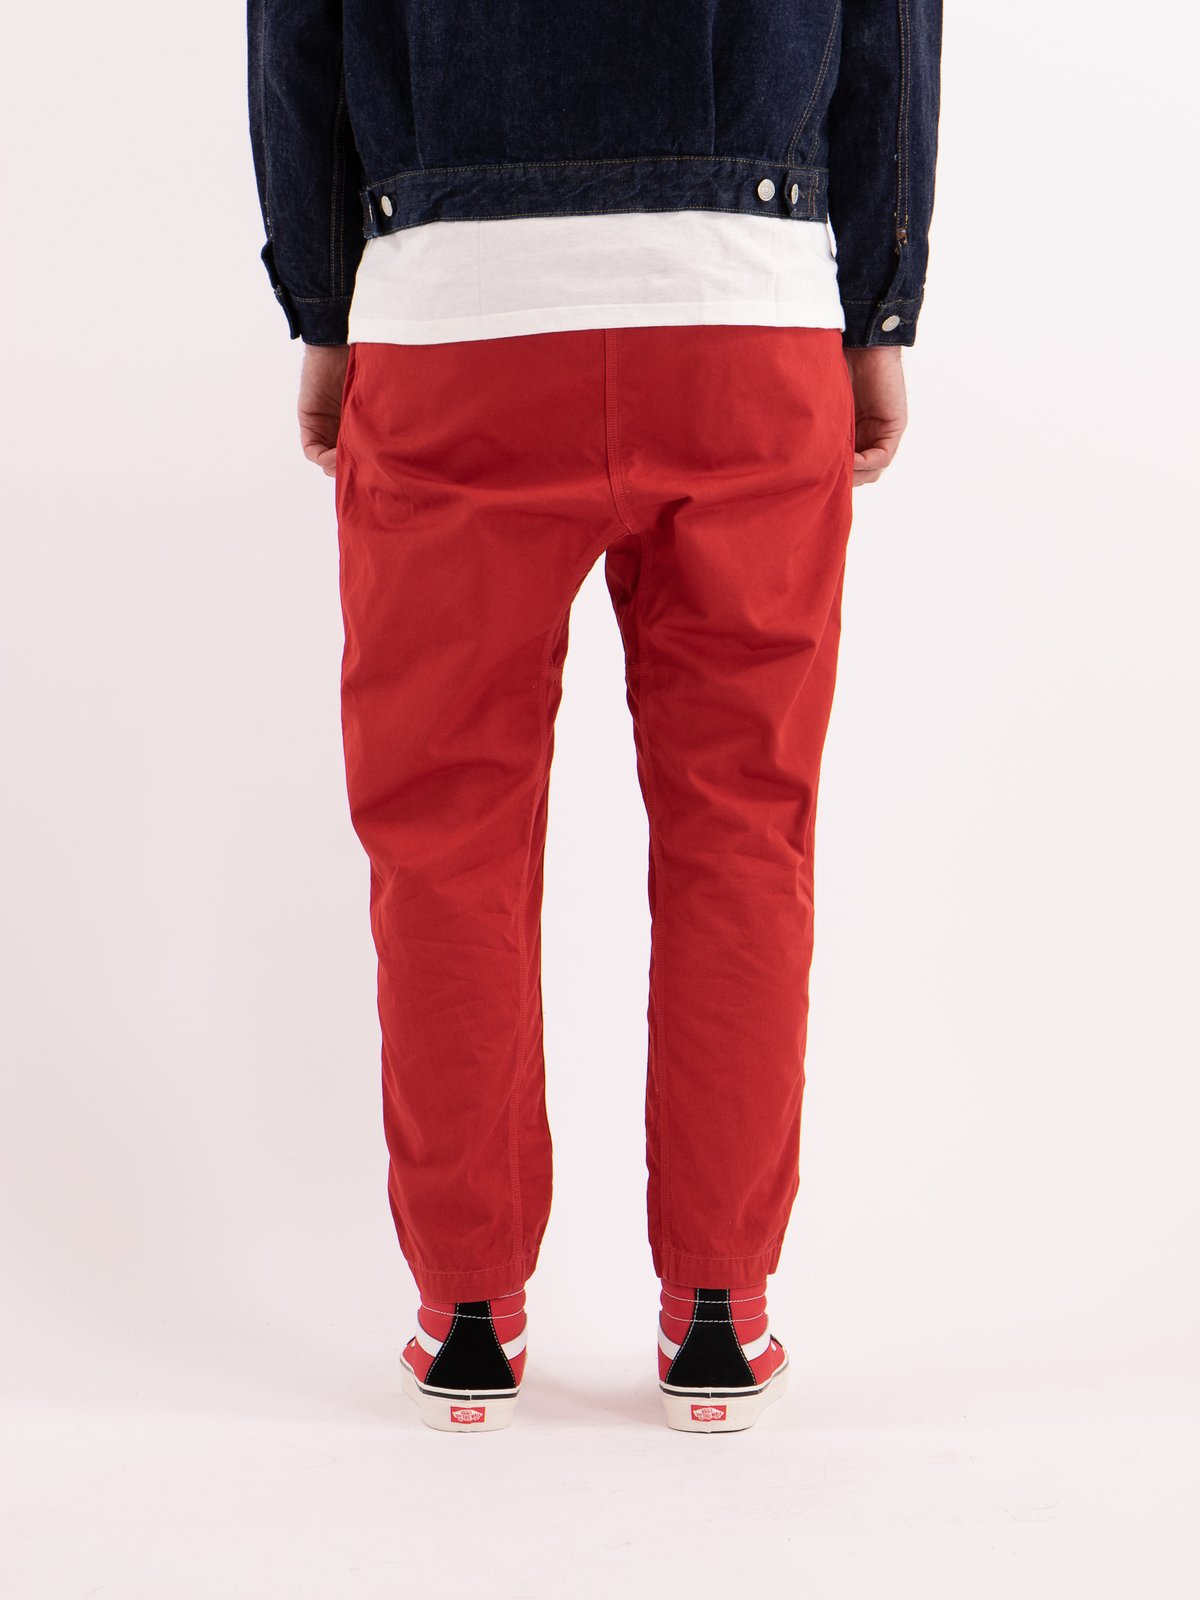 Red Overdyed Poplin Climbing Pant - Image 4